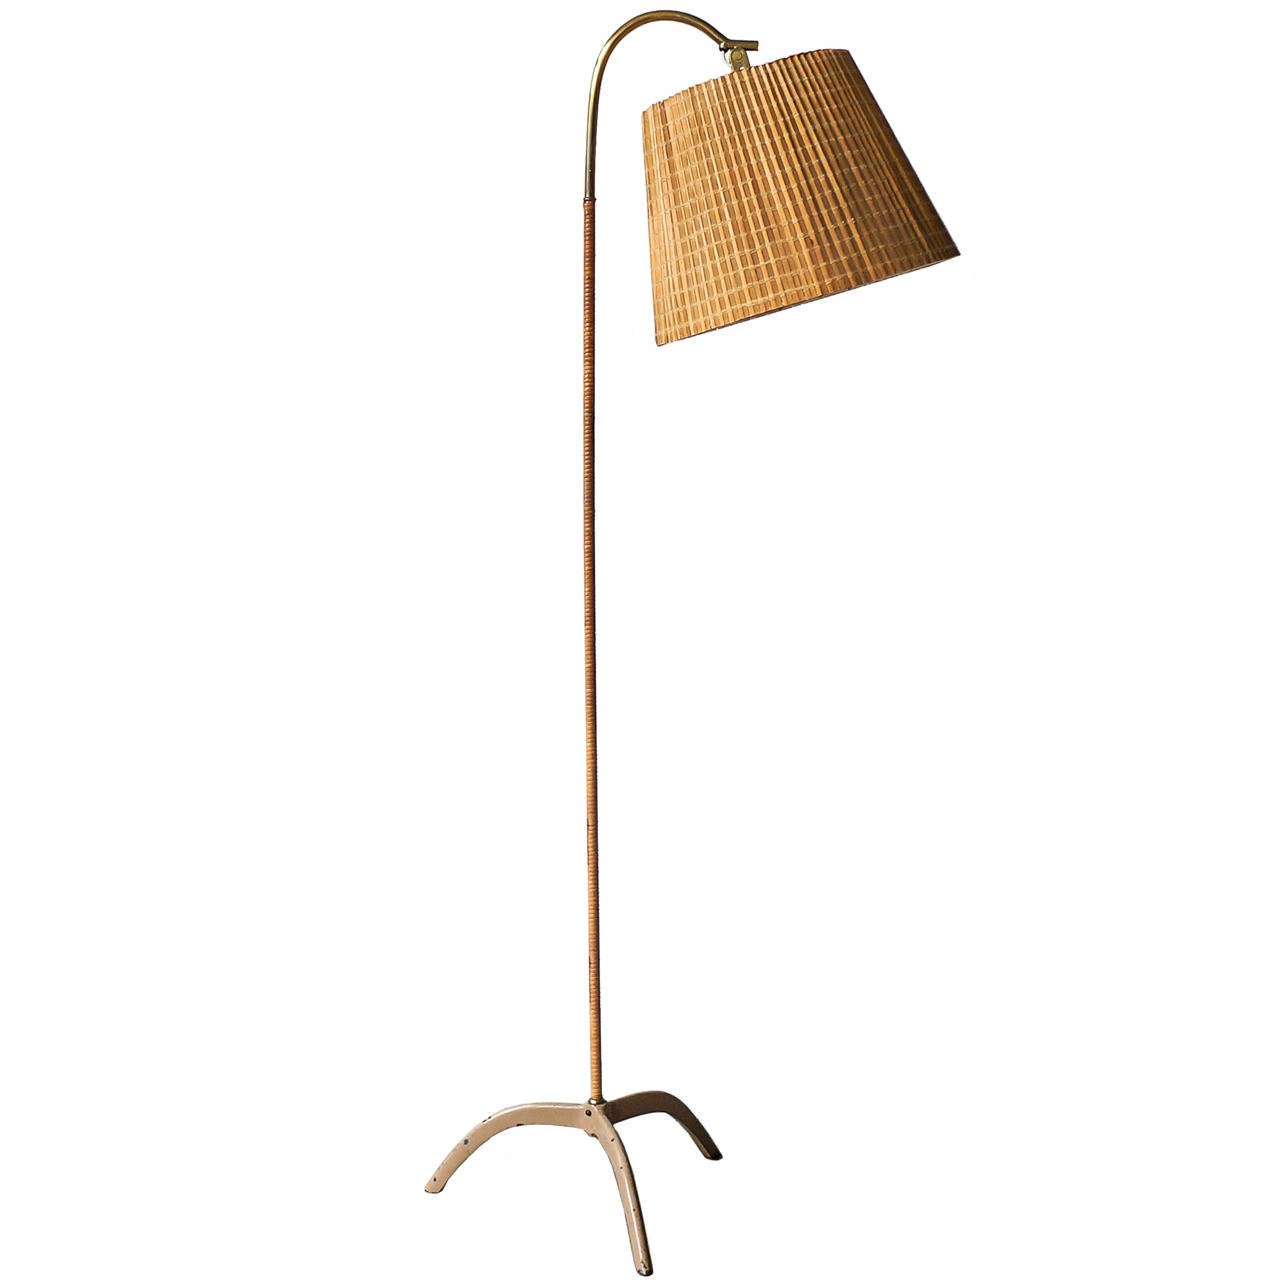 Paavo Tynell Floor Lamp, Model 9609, Taito Oy, 1940s